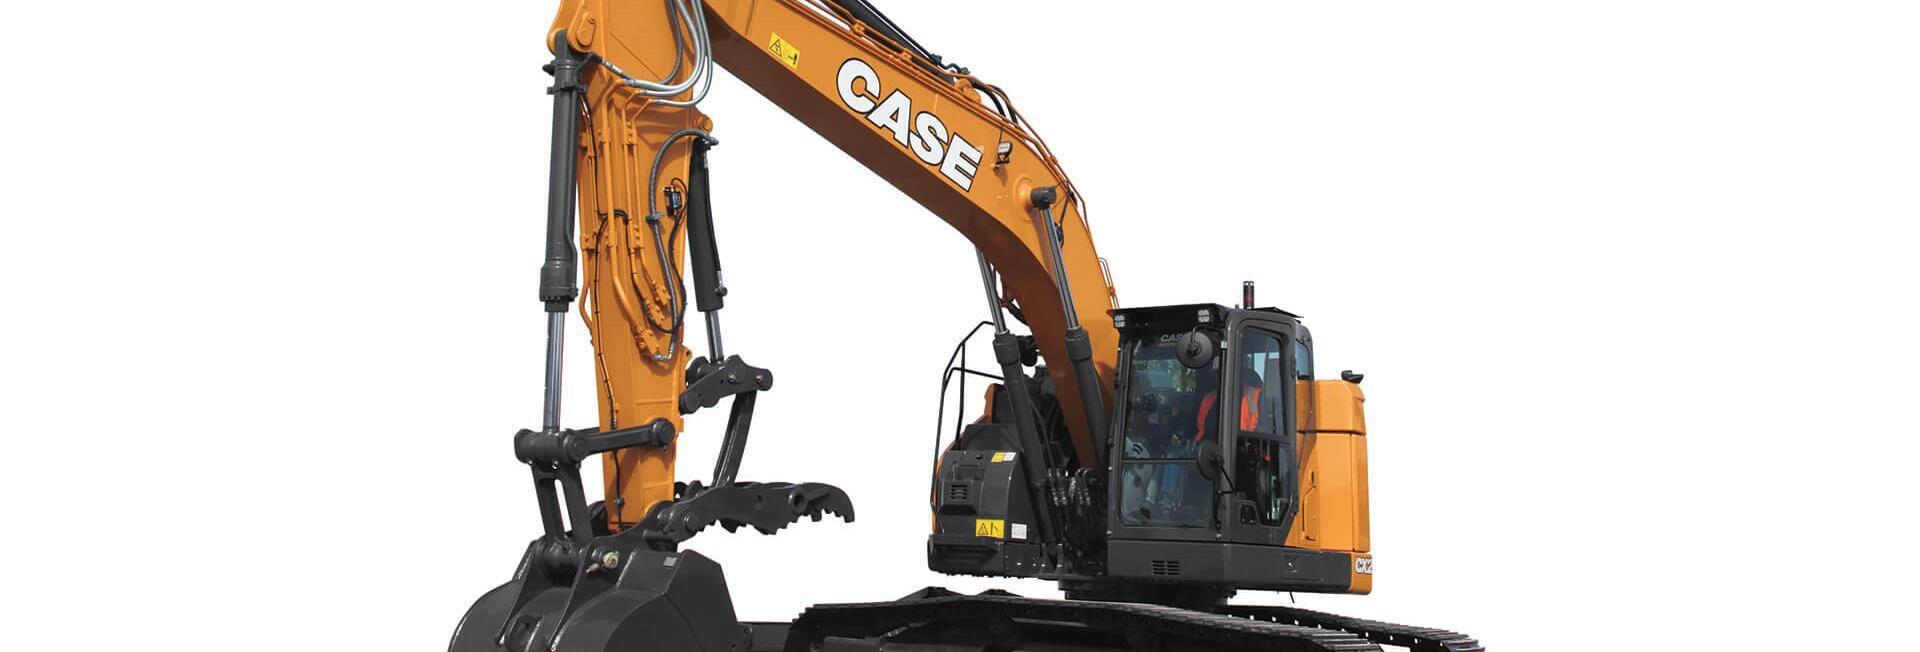 https://assets.cnhindustrial.com/casece/nafta/assets/Products/Excavators/Full-Size-Excavators/CCE_EXC_DSER_photo_3-13-17_CX245D_SR_IMG_9268.jpg?Width=800&Height=450